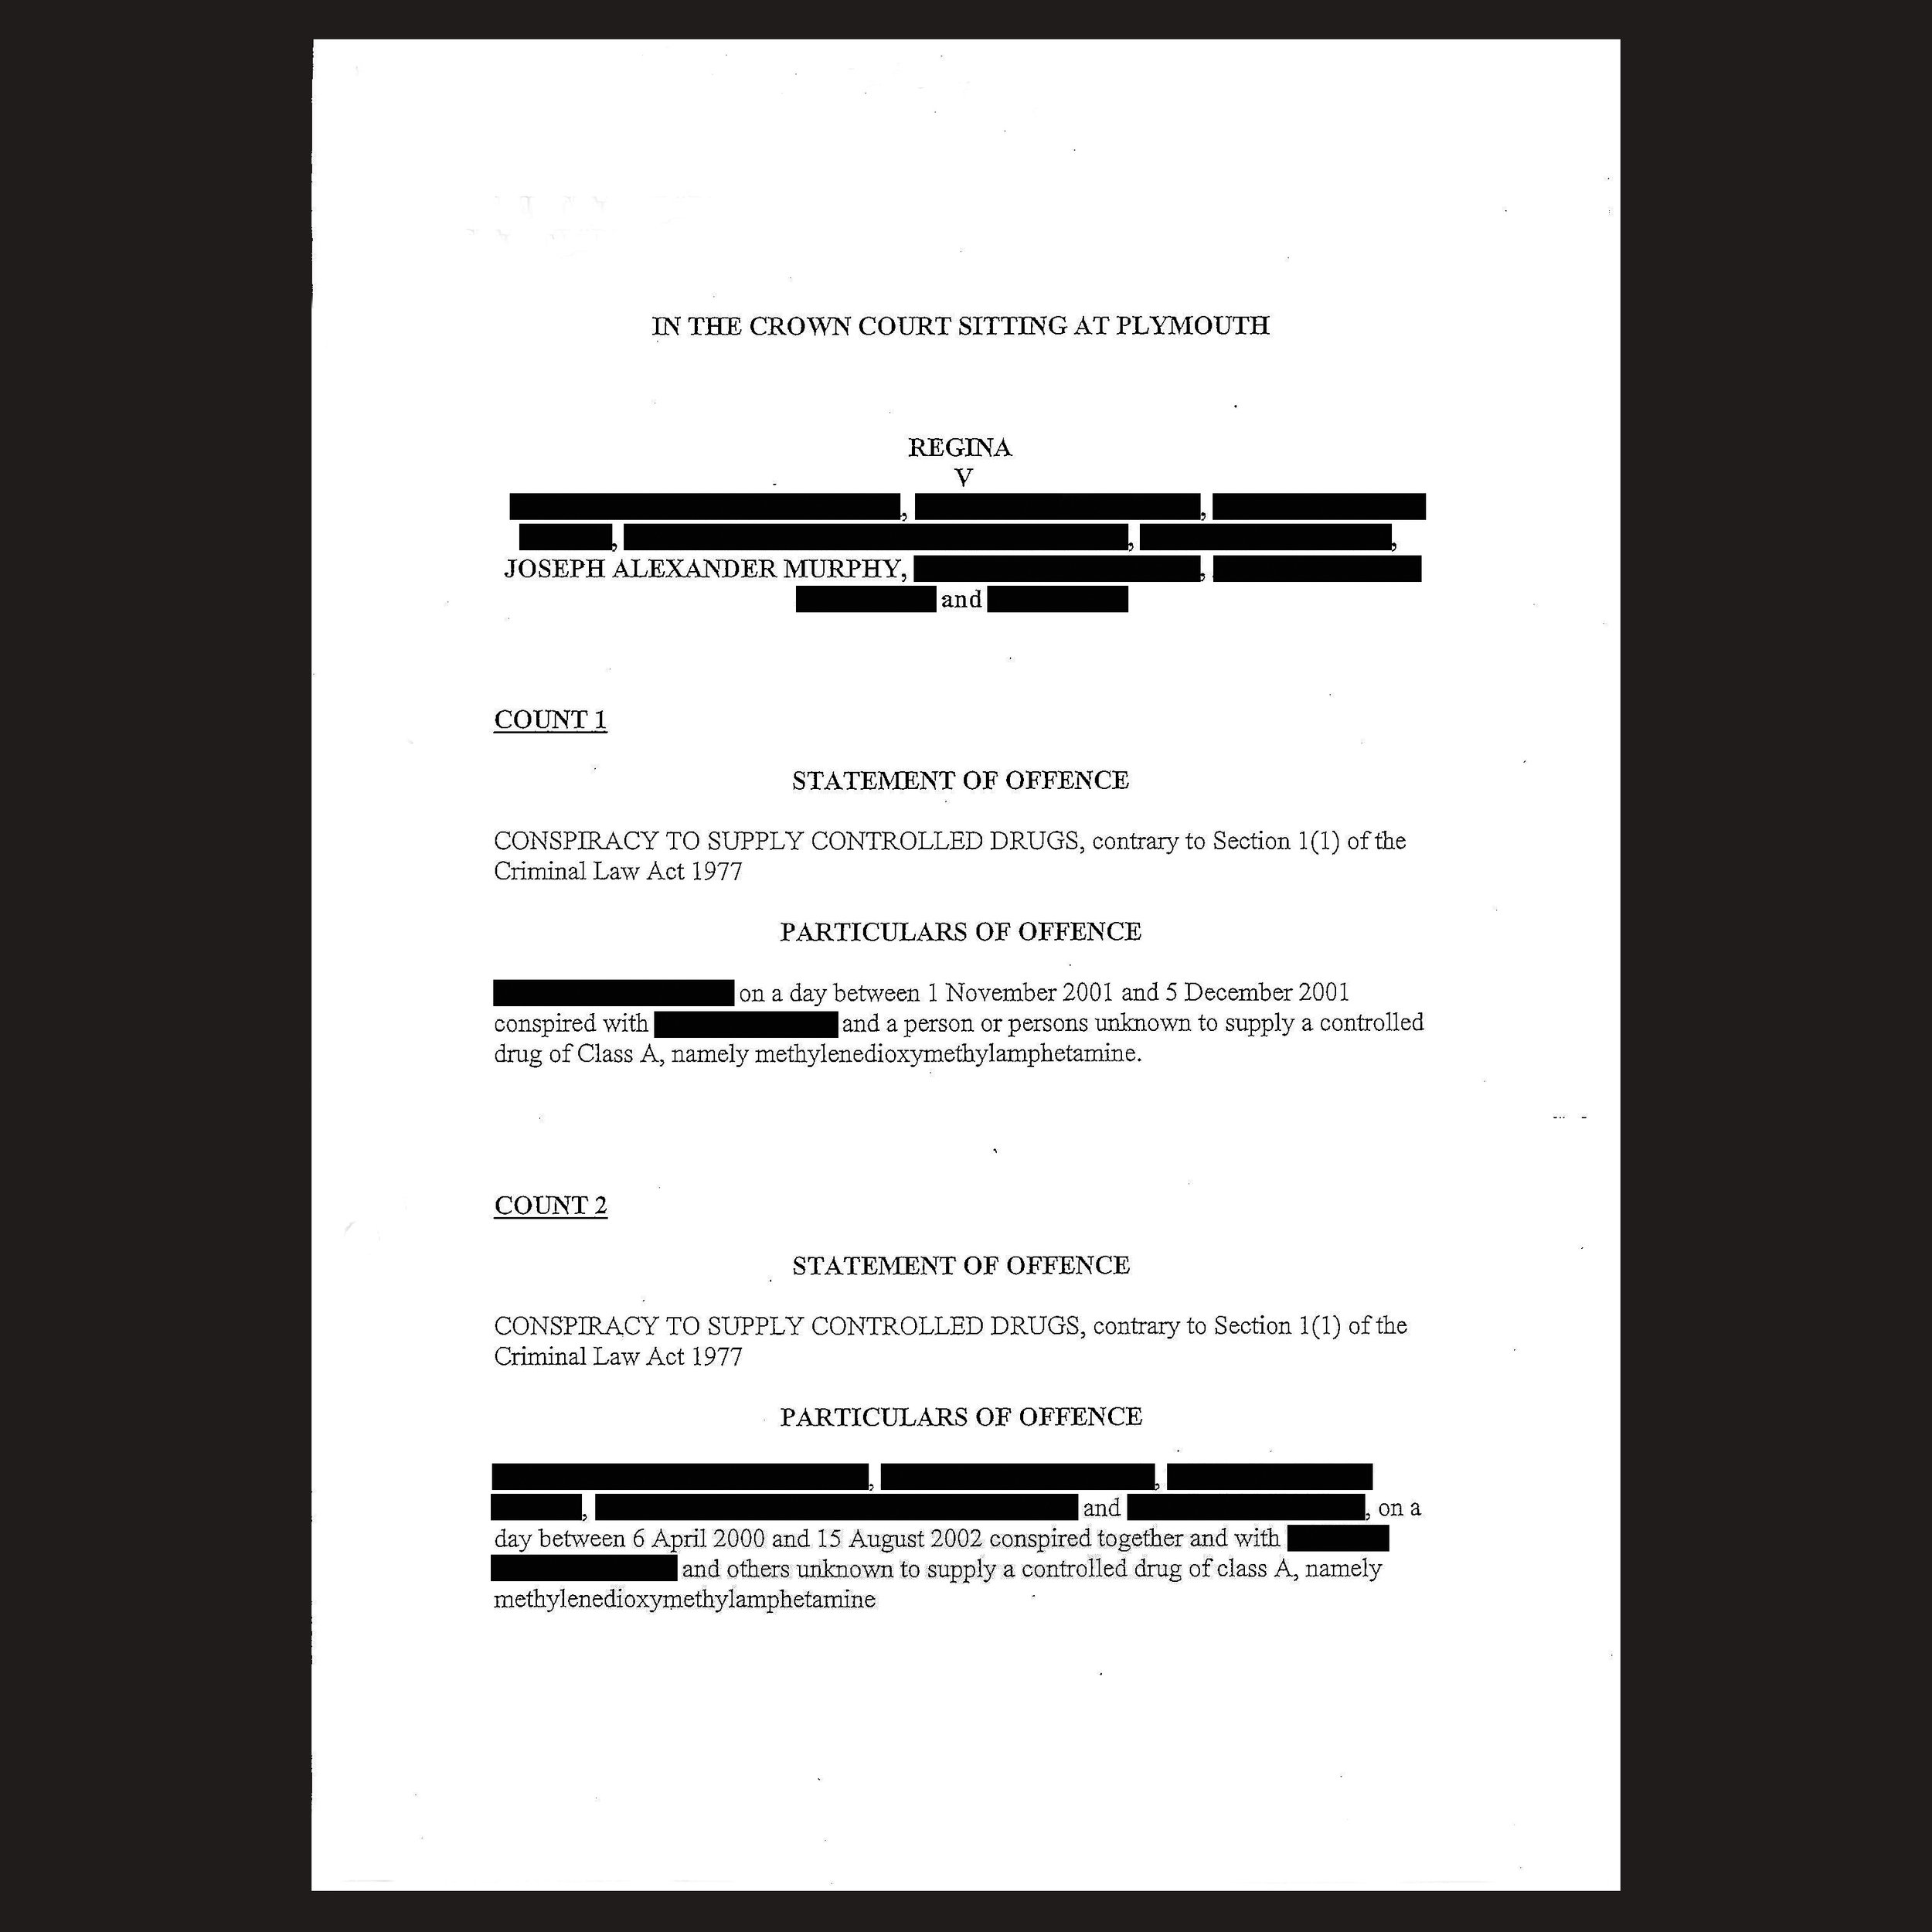 JM Bail 133 - Court Statement of Offences - Part 1.jpg